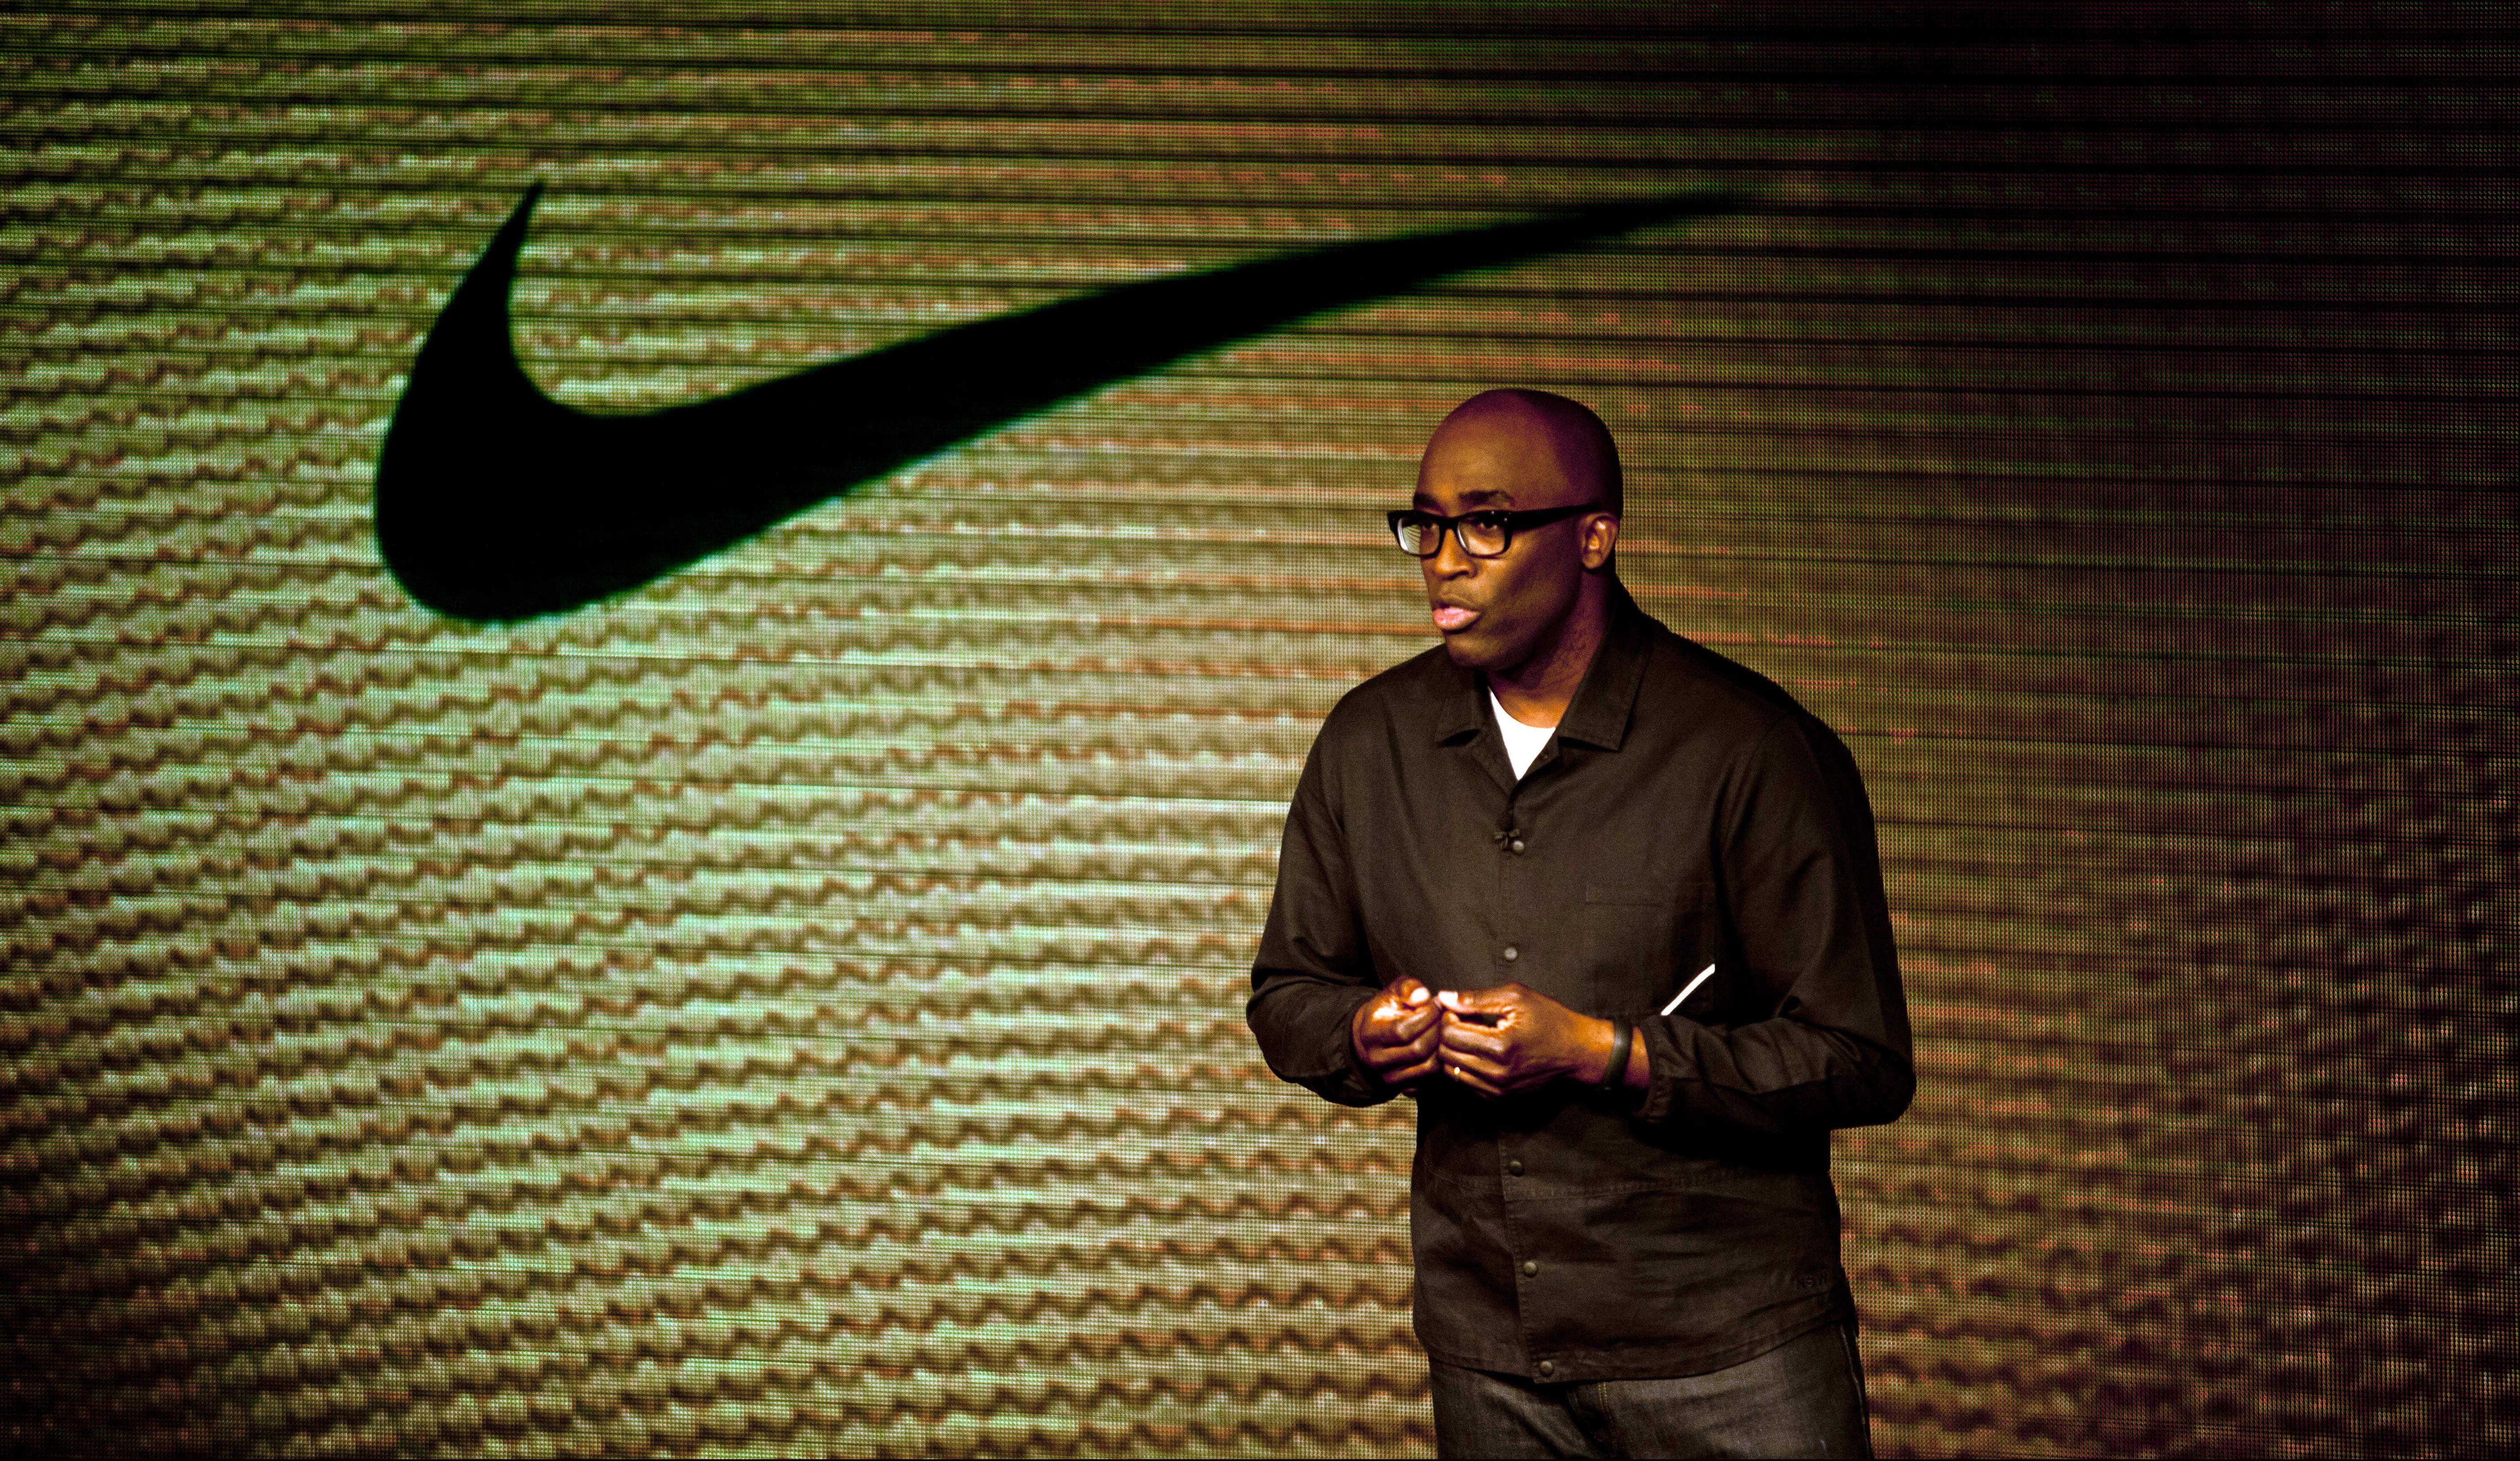 Trevor Edwards, Nike's brand president, speaks during a presentation of Brazil's new national soccer team uniform kit, designed by Nike, in Rio de Janeiro, Brazil, Sunday, Nov. 24, 2013. (AP Photo/ Dado Galdieri)